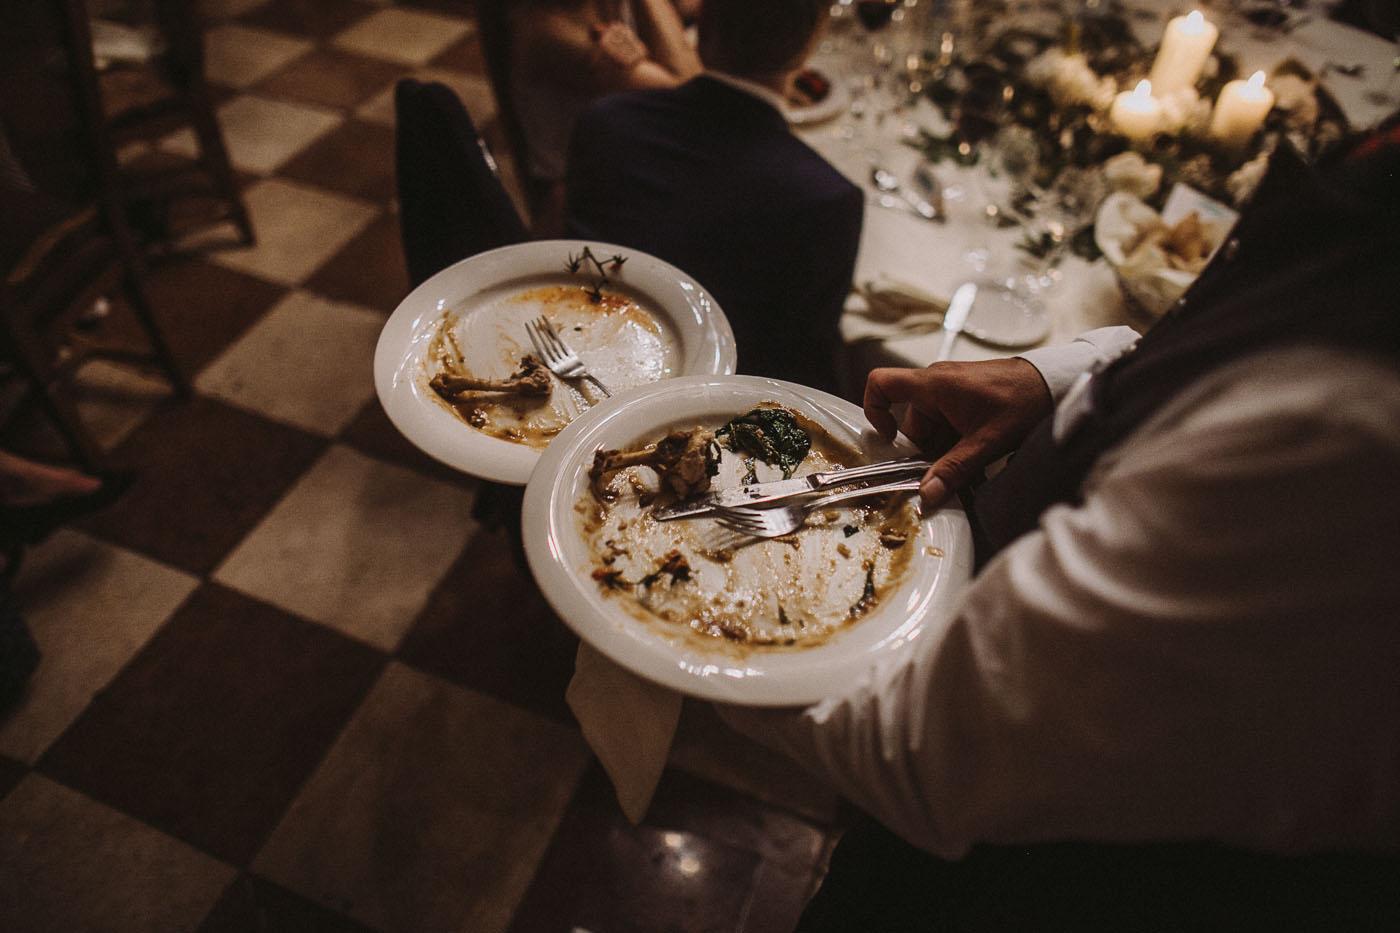 wedding-leopoldskron-photographer-73